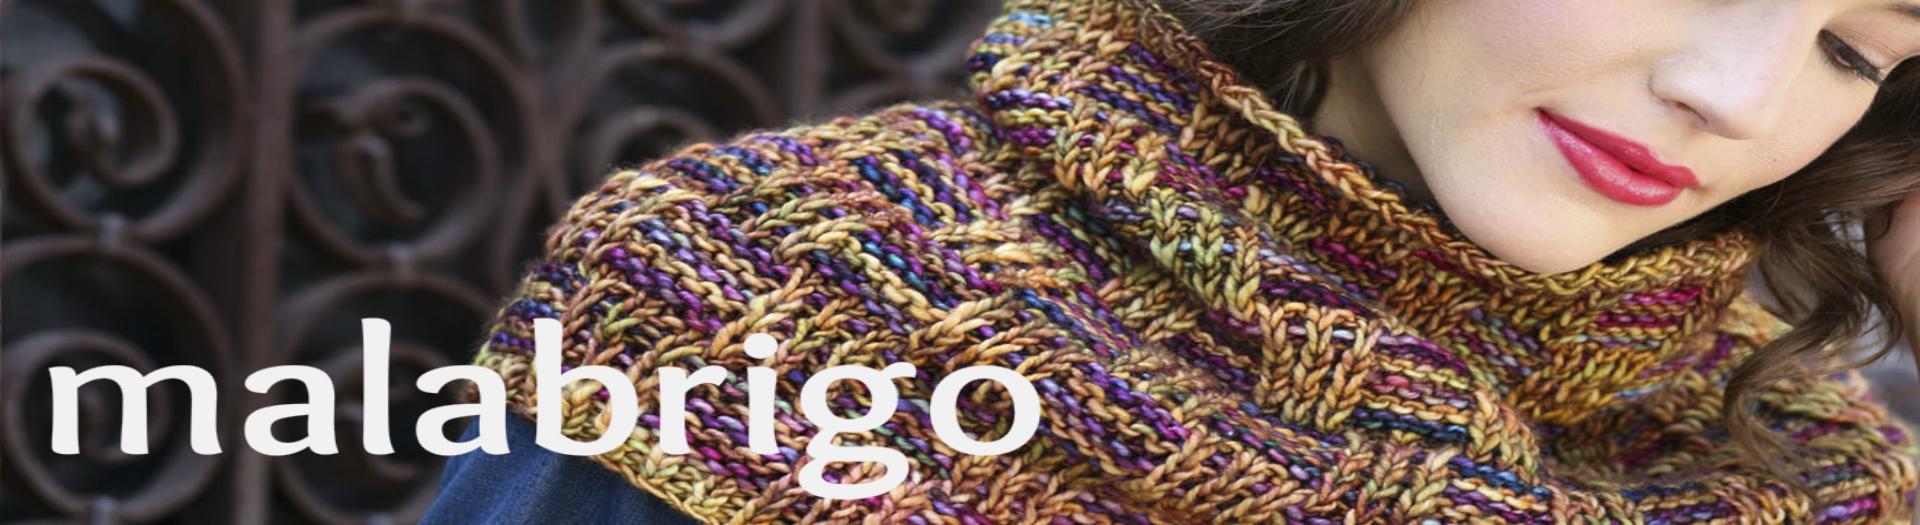 The Yarn Lady Knitting, Crochet & Yarn Store in Lady Lake, Florida